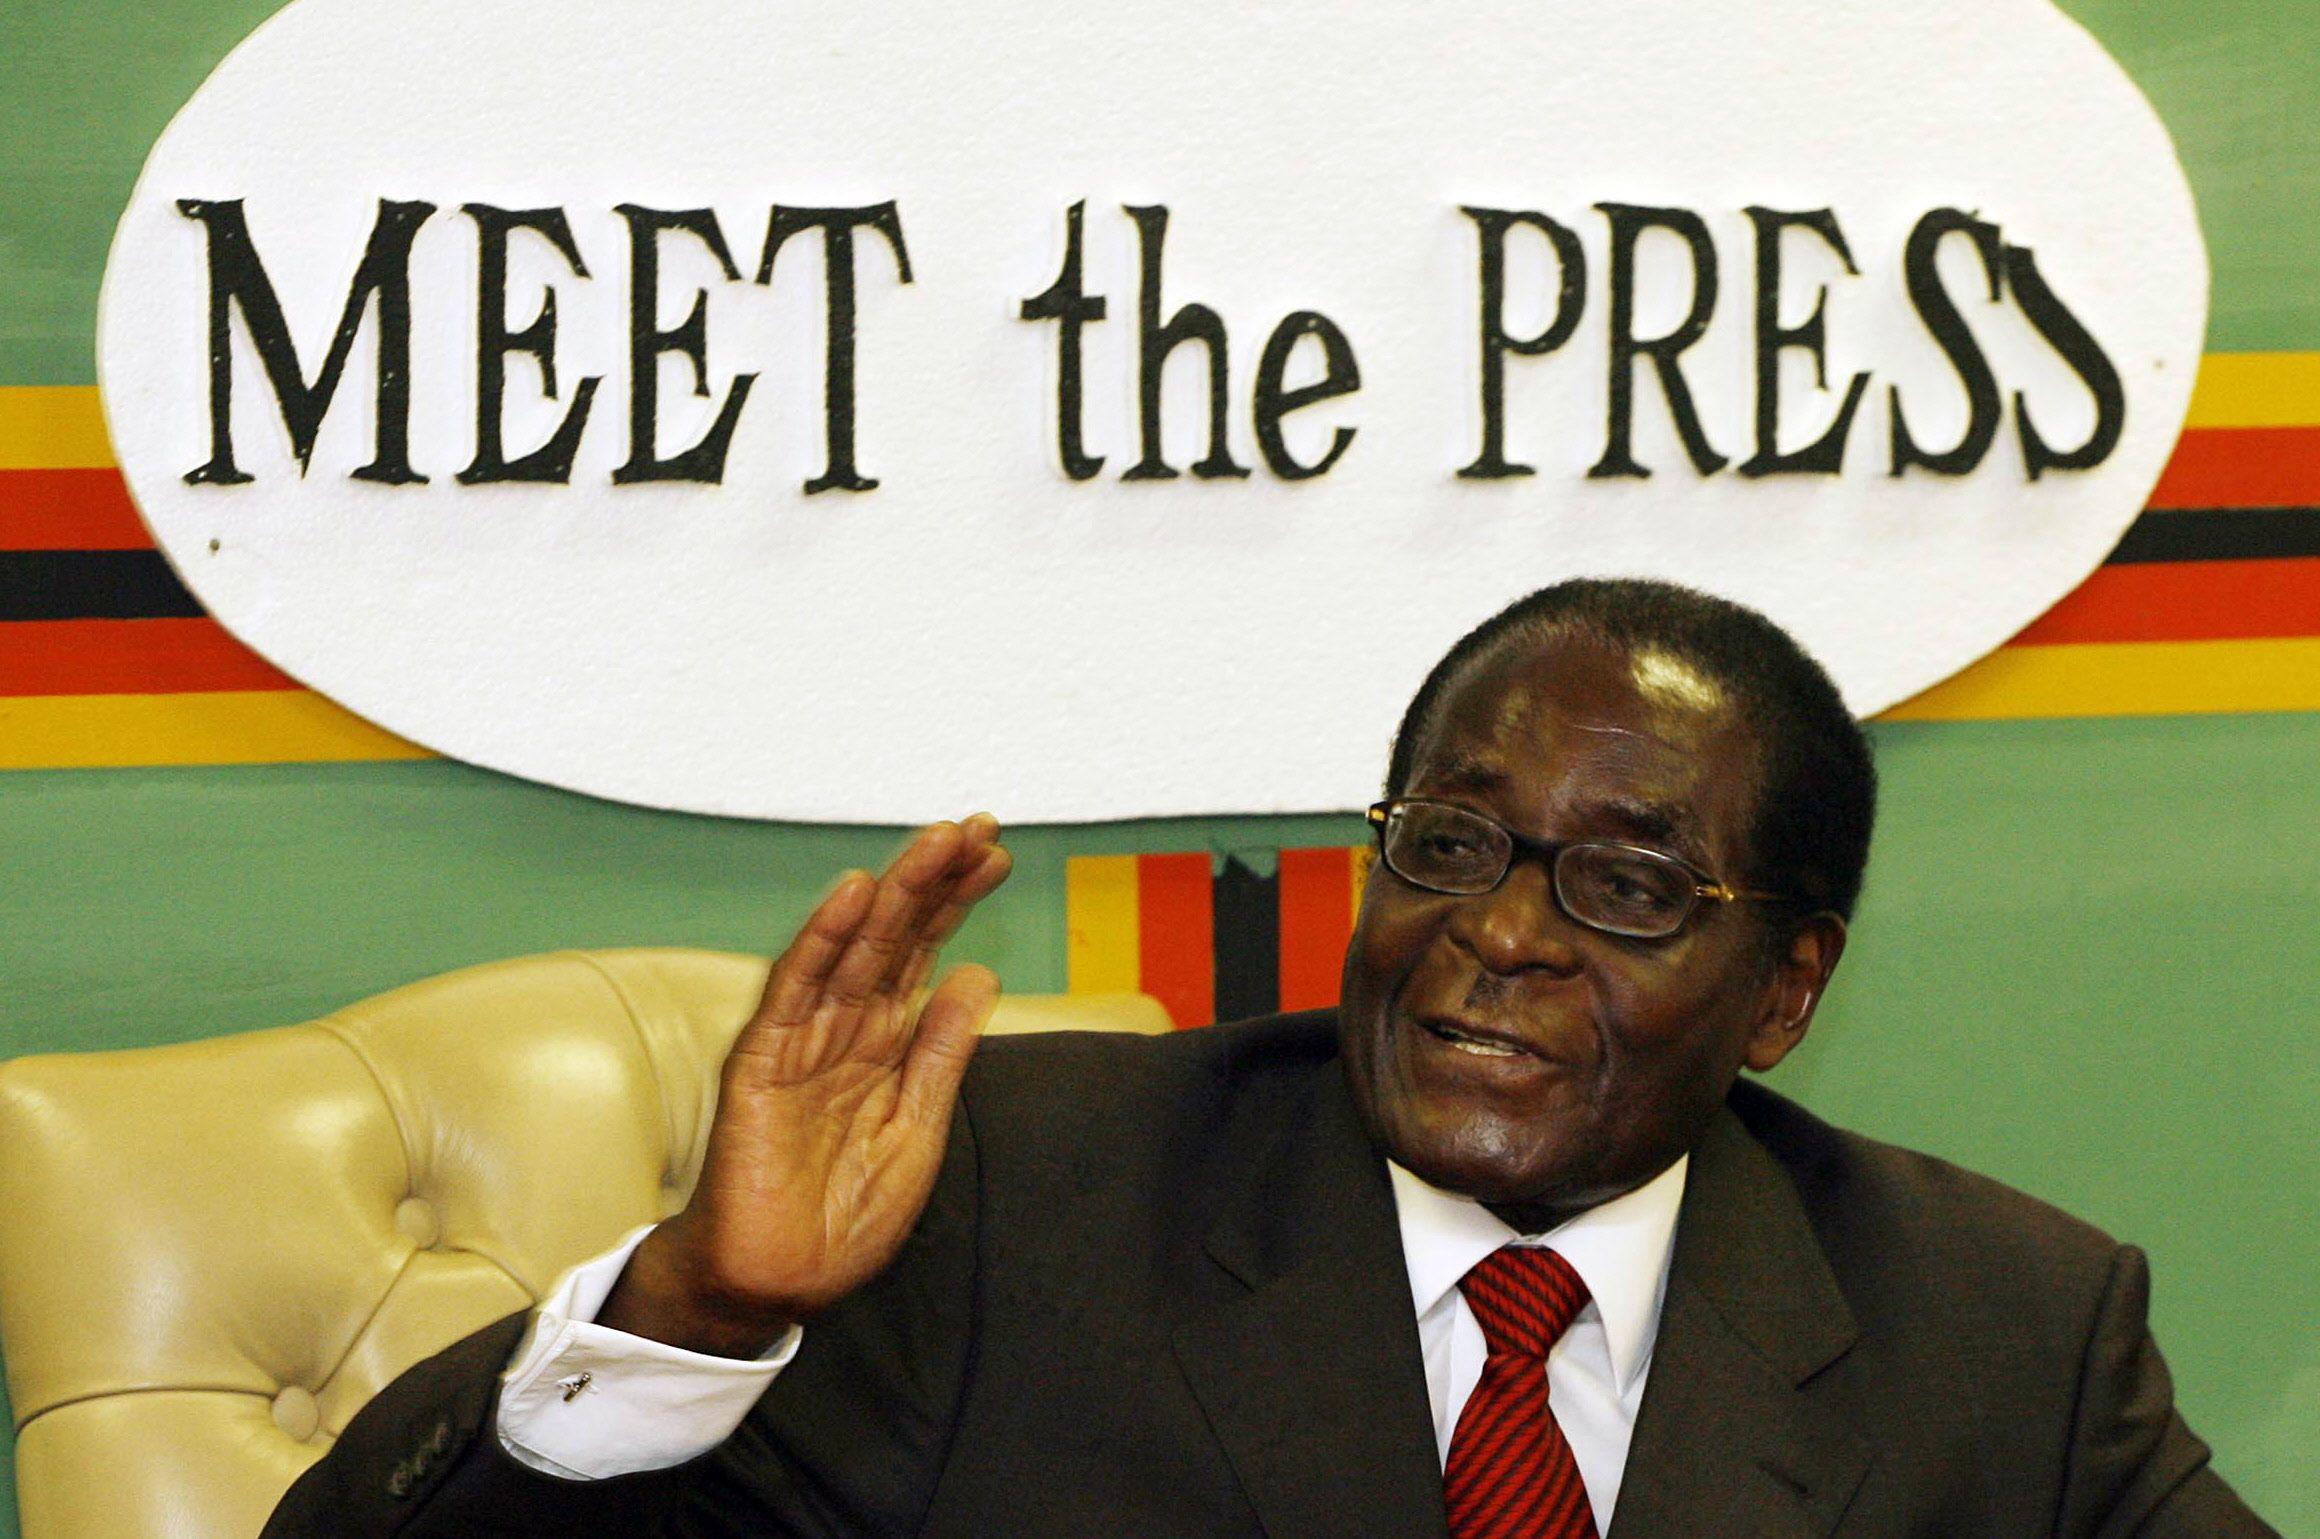 Robert Mugabe meets the press